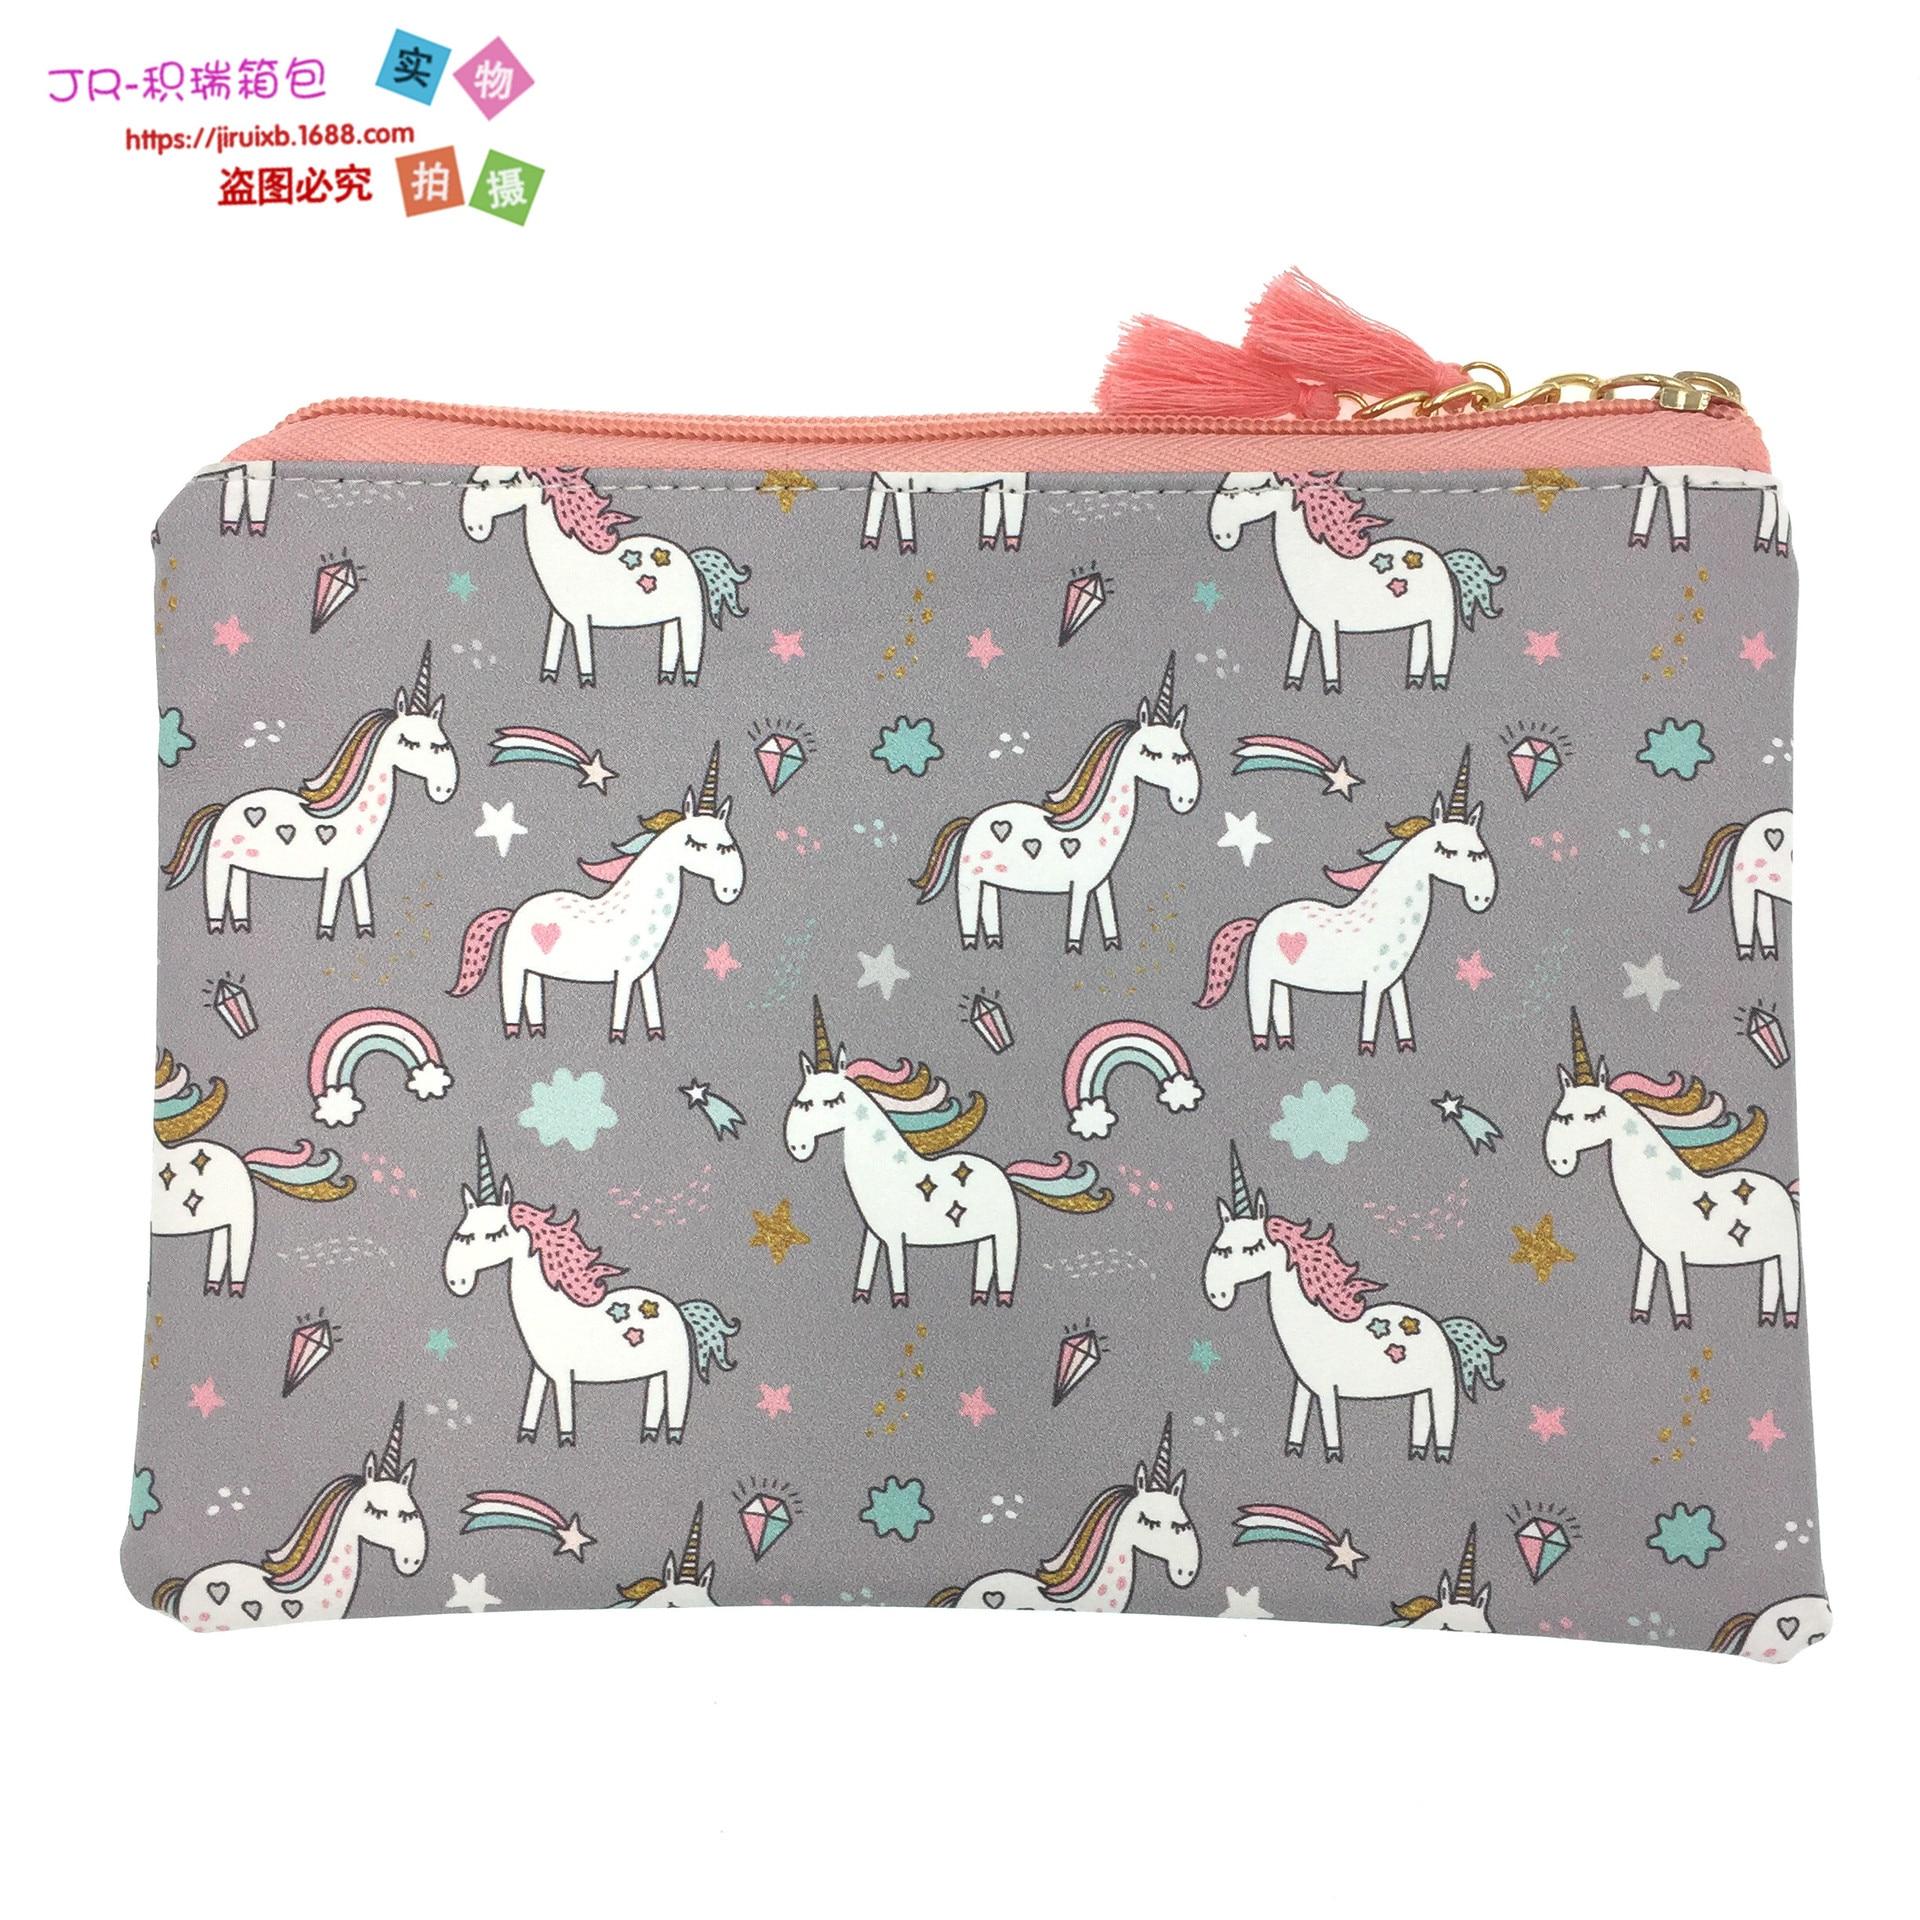 2018-Europe And America Hot Sales Unicorn PU Purse Document Package Tassels Cosmetic Bag Clutch Batch